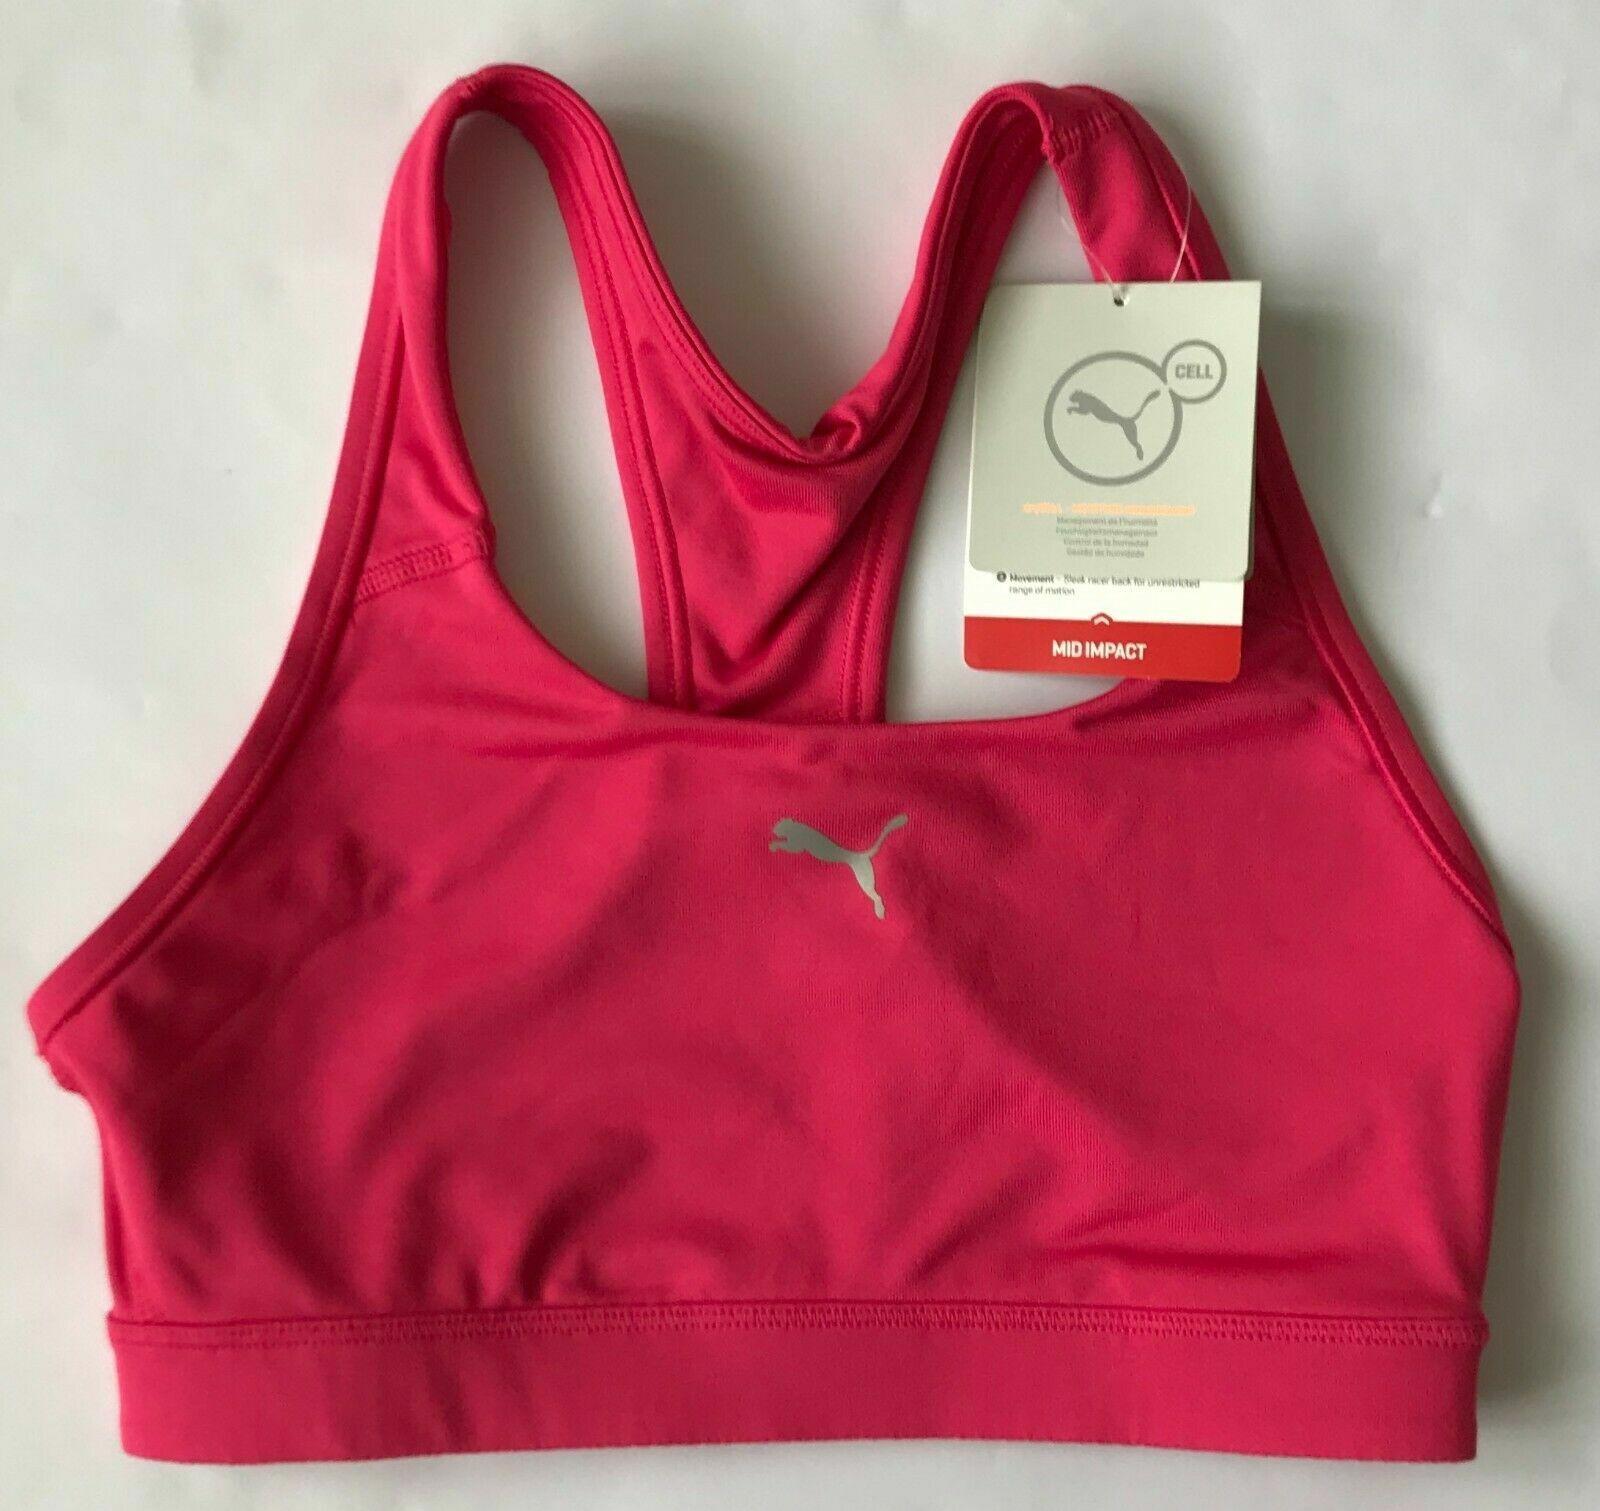 Puma Women's Power Shape Forever Sparkling Cosmo Sports Bra 513965 Size UK 10